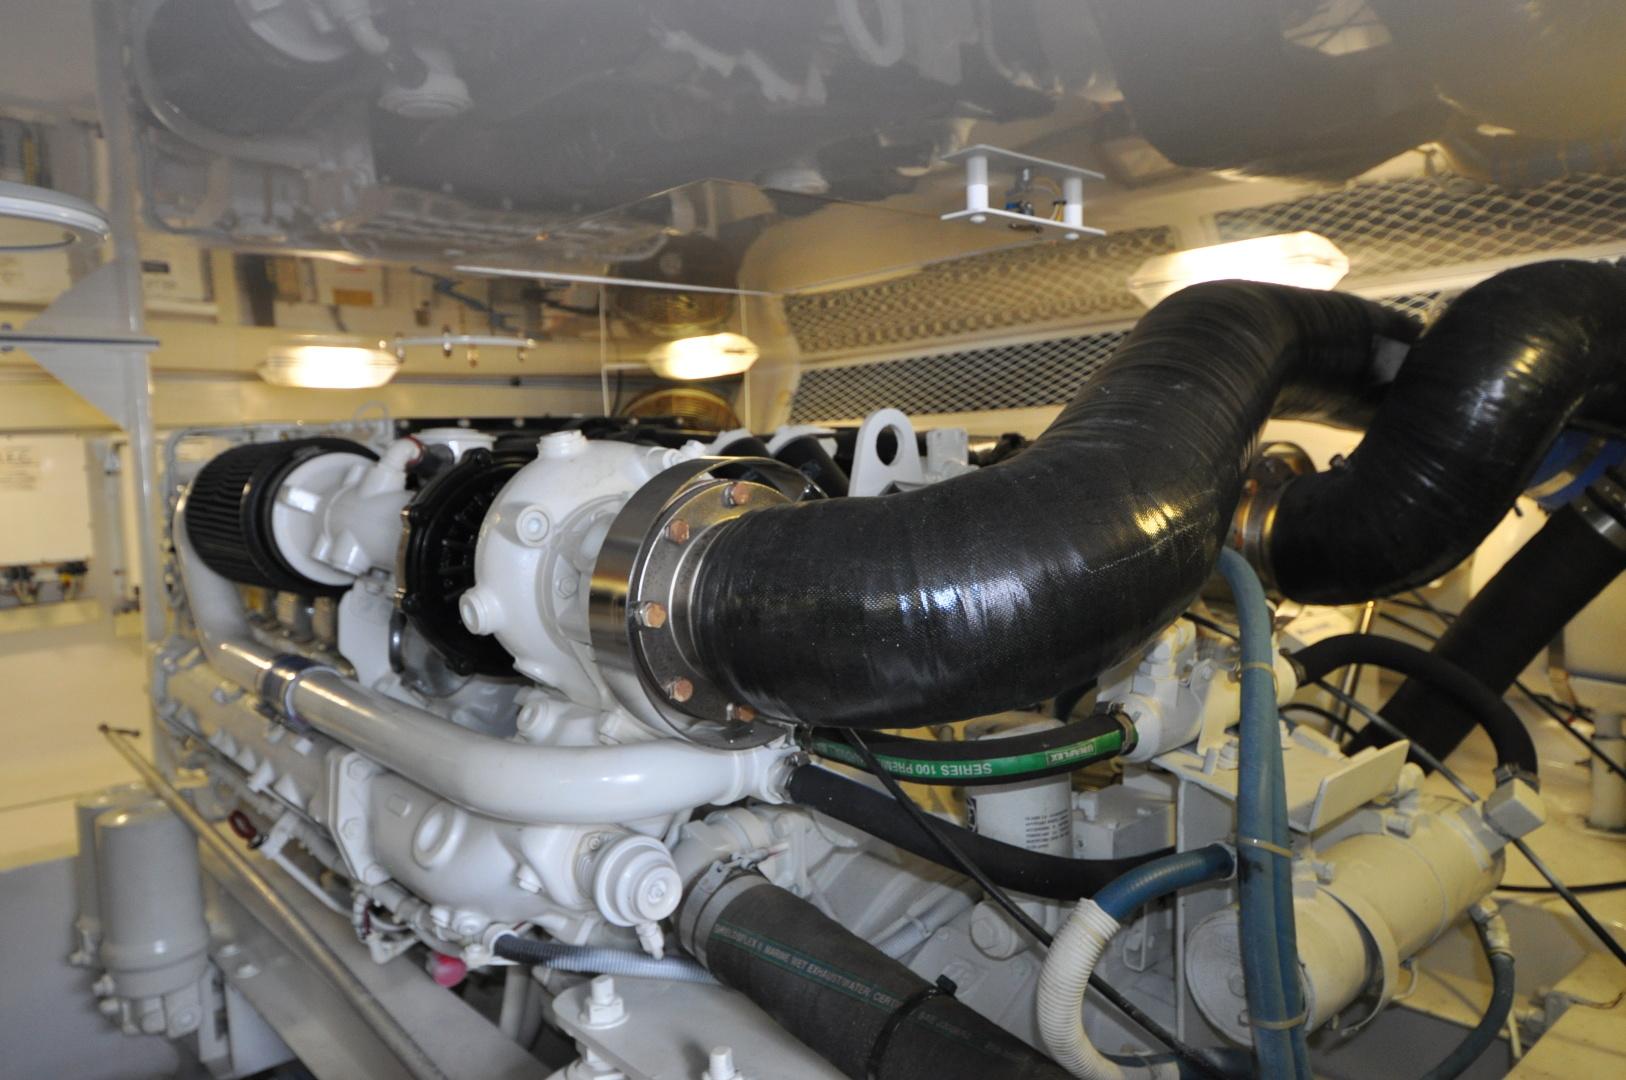 Viking-Convertible 2003-Reel Cowboy Deerfield Beach-Florida-United States-Engine Room-1546885 | Thumbnail